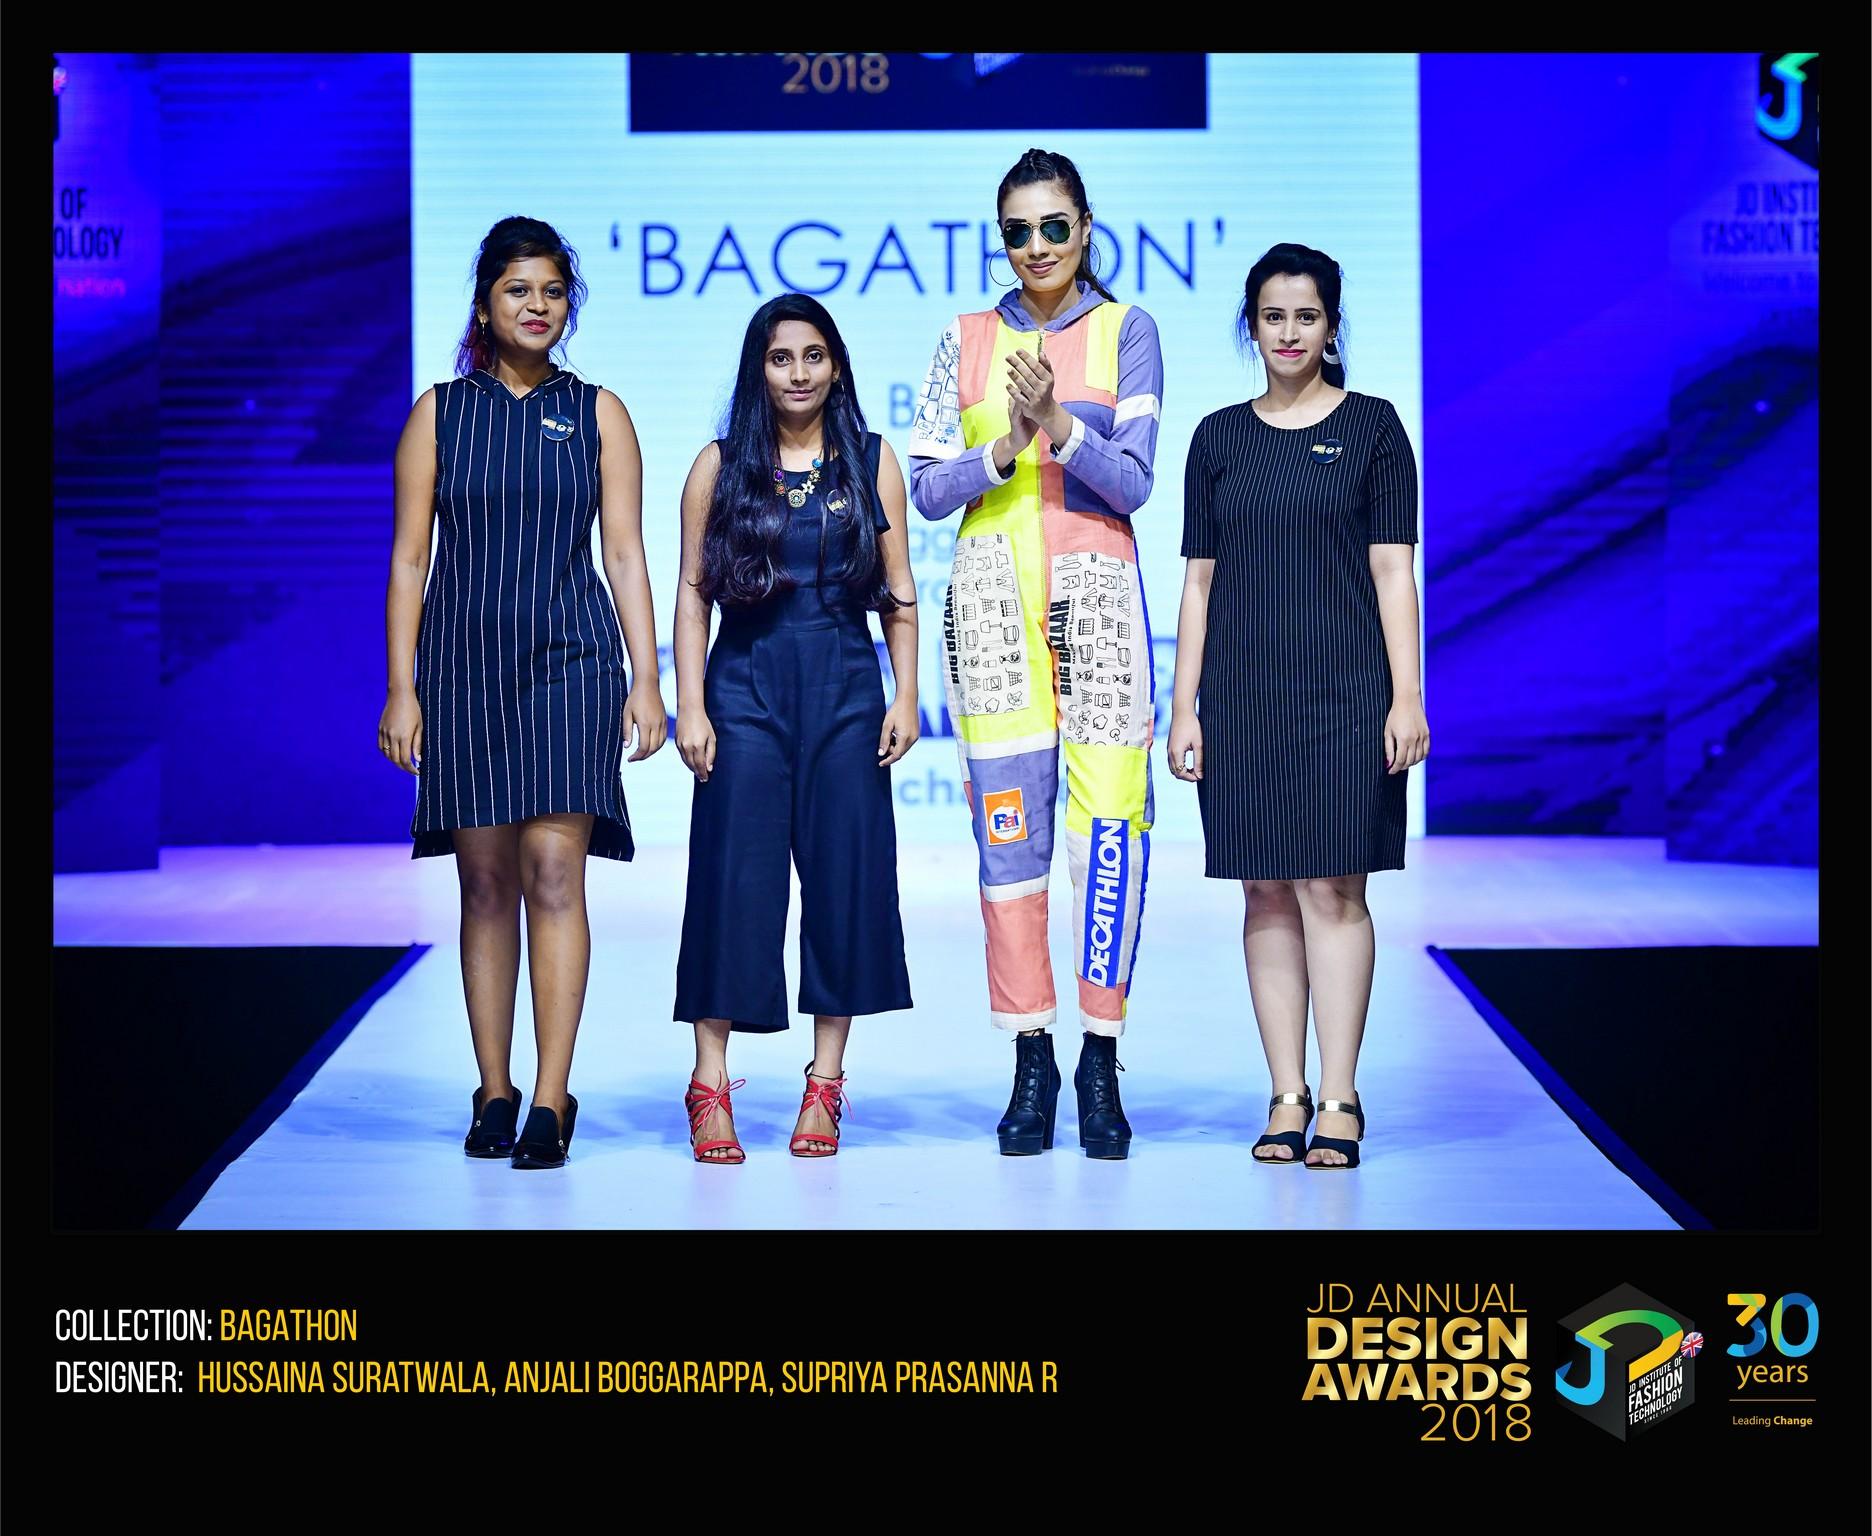 Bagathon – Change – JD Annual Design Awards 2018 | Designer: Supriya, Anjali and Hussaina | Photography : Jerin Nath (@jerin_nath) bagathon – change – jd annual design awards 2018 - BAGATHON 7 - Bagathon – Change – JD Annual Design Awards 2018